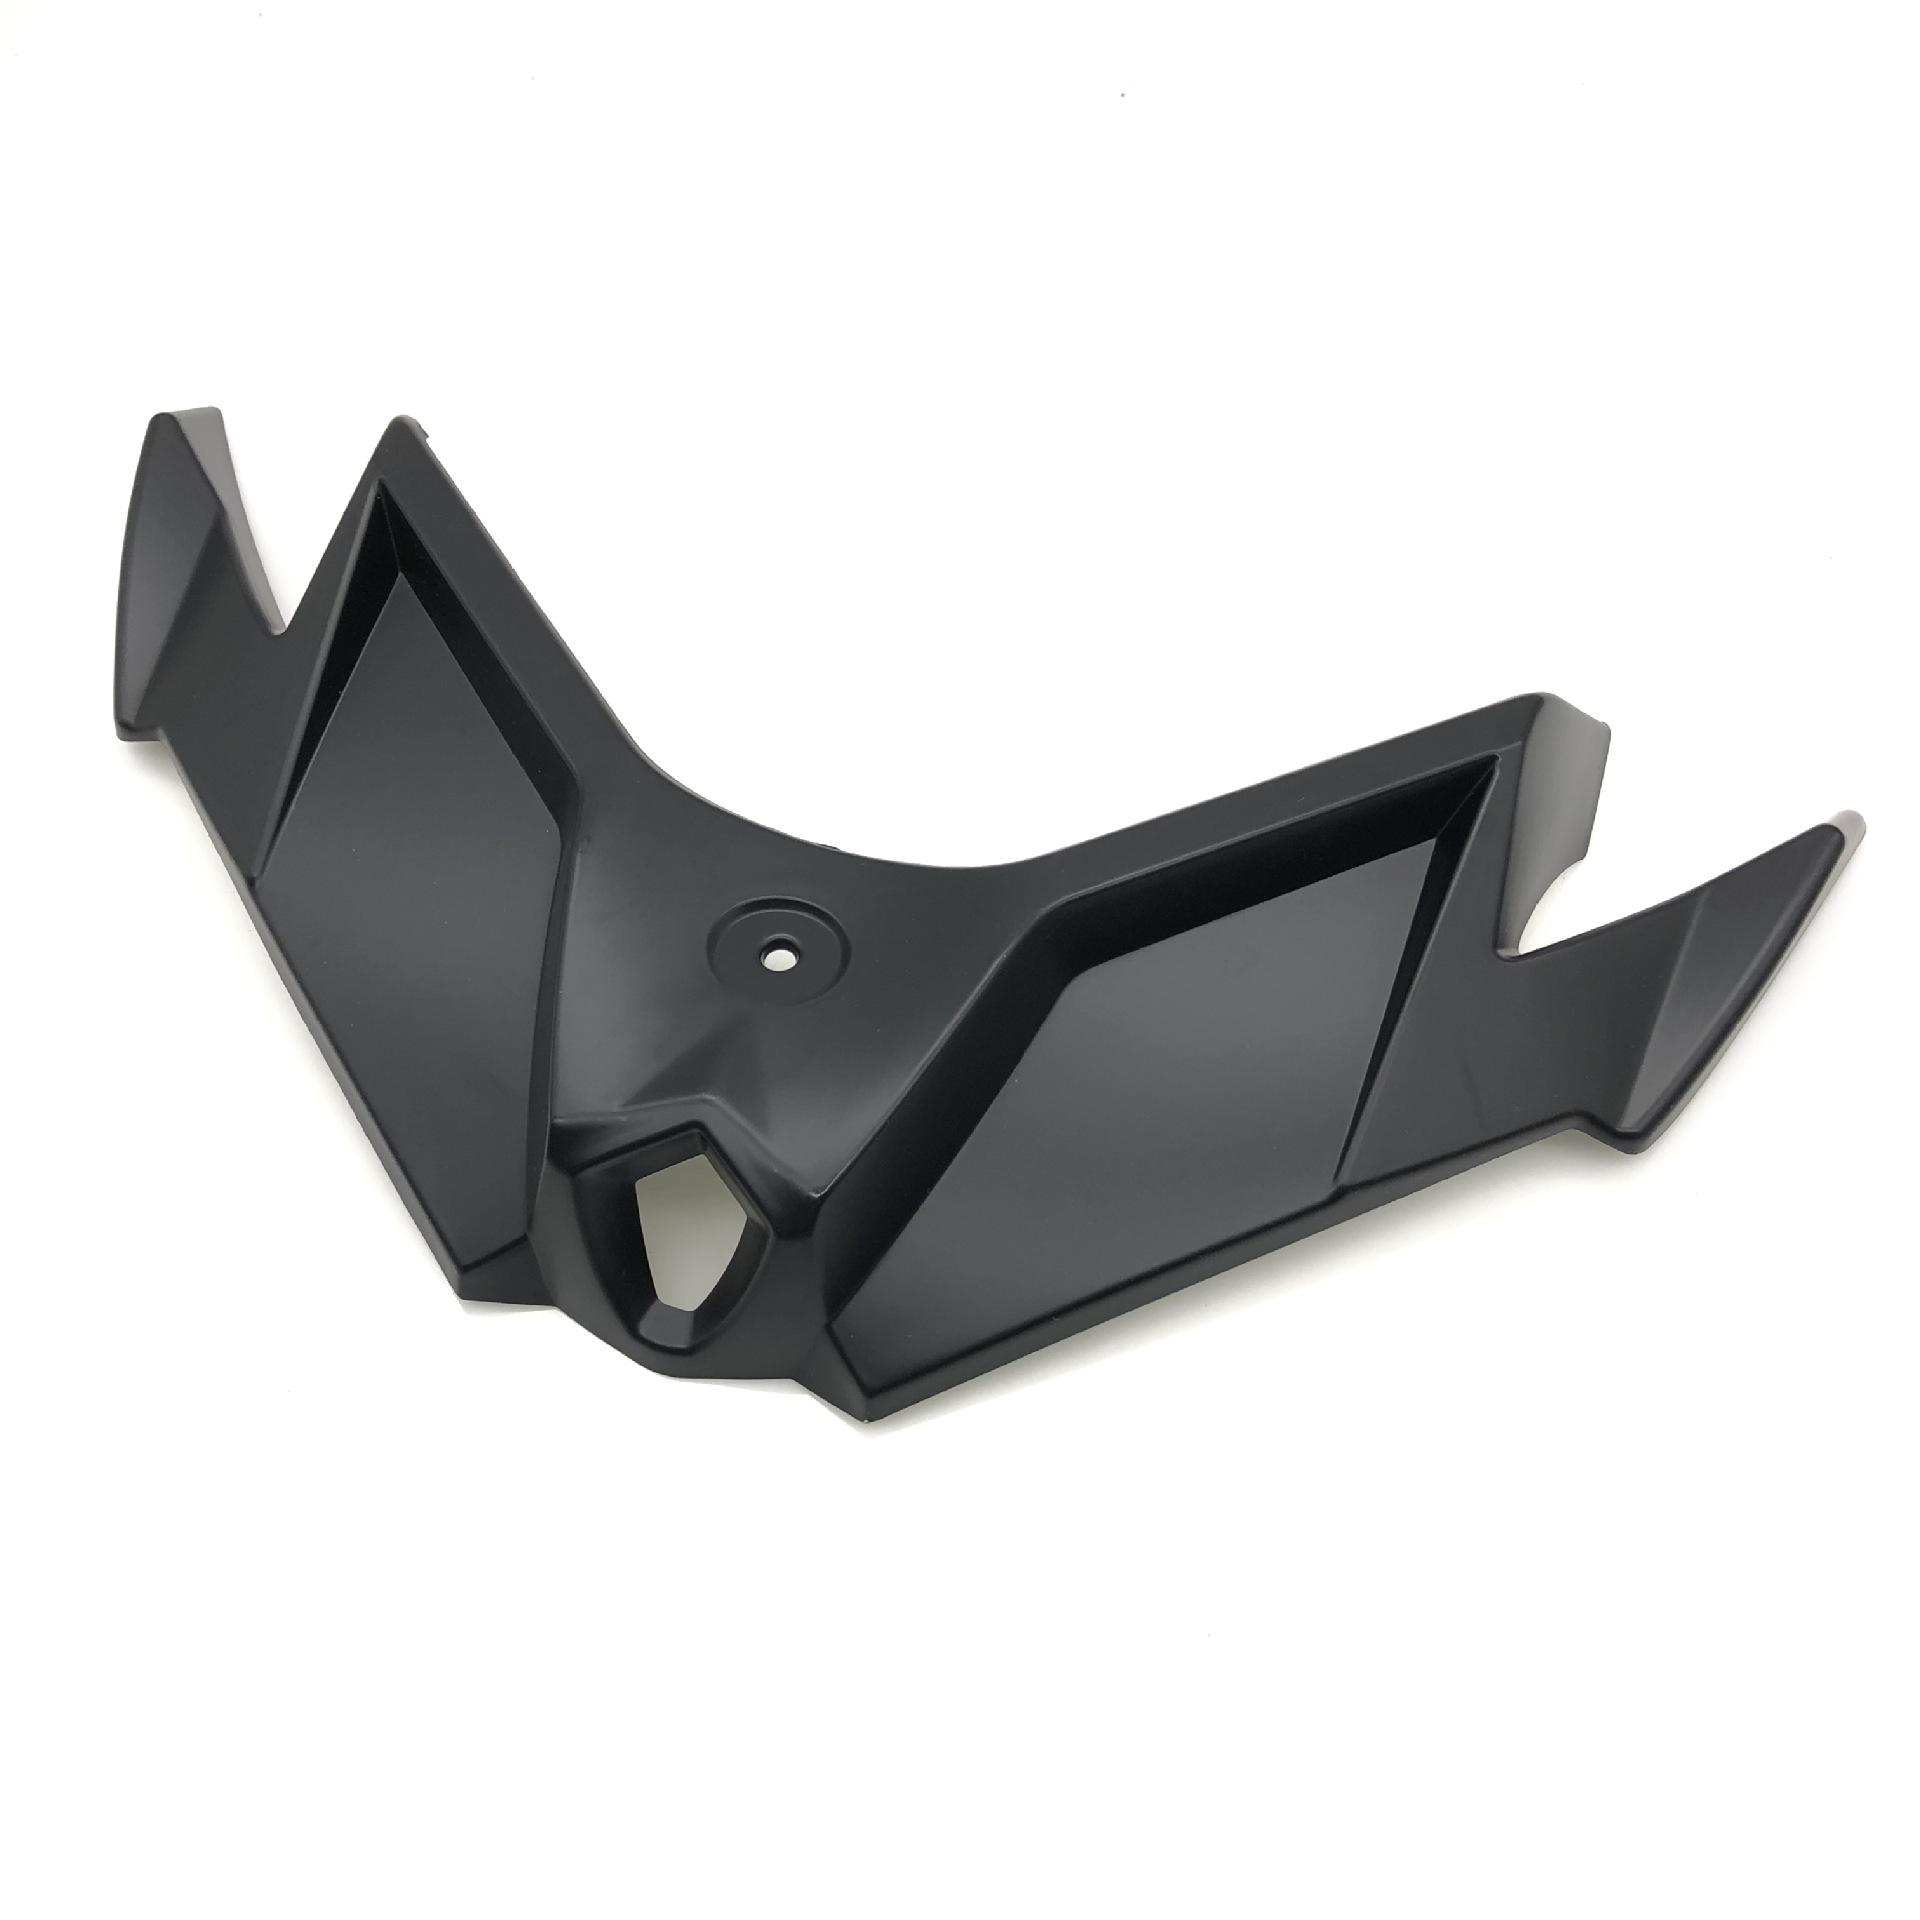 Motorcycle Fairing Aerodynamic Winglets Front  Cover Carbon Fiber Style Wind Wing Decoration For Kawasaki Ninja250/300 black